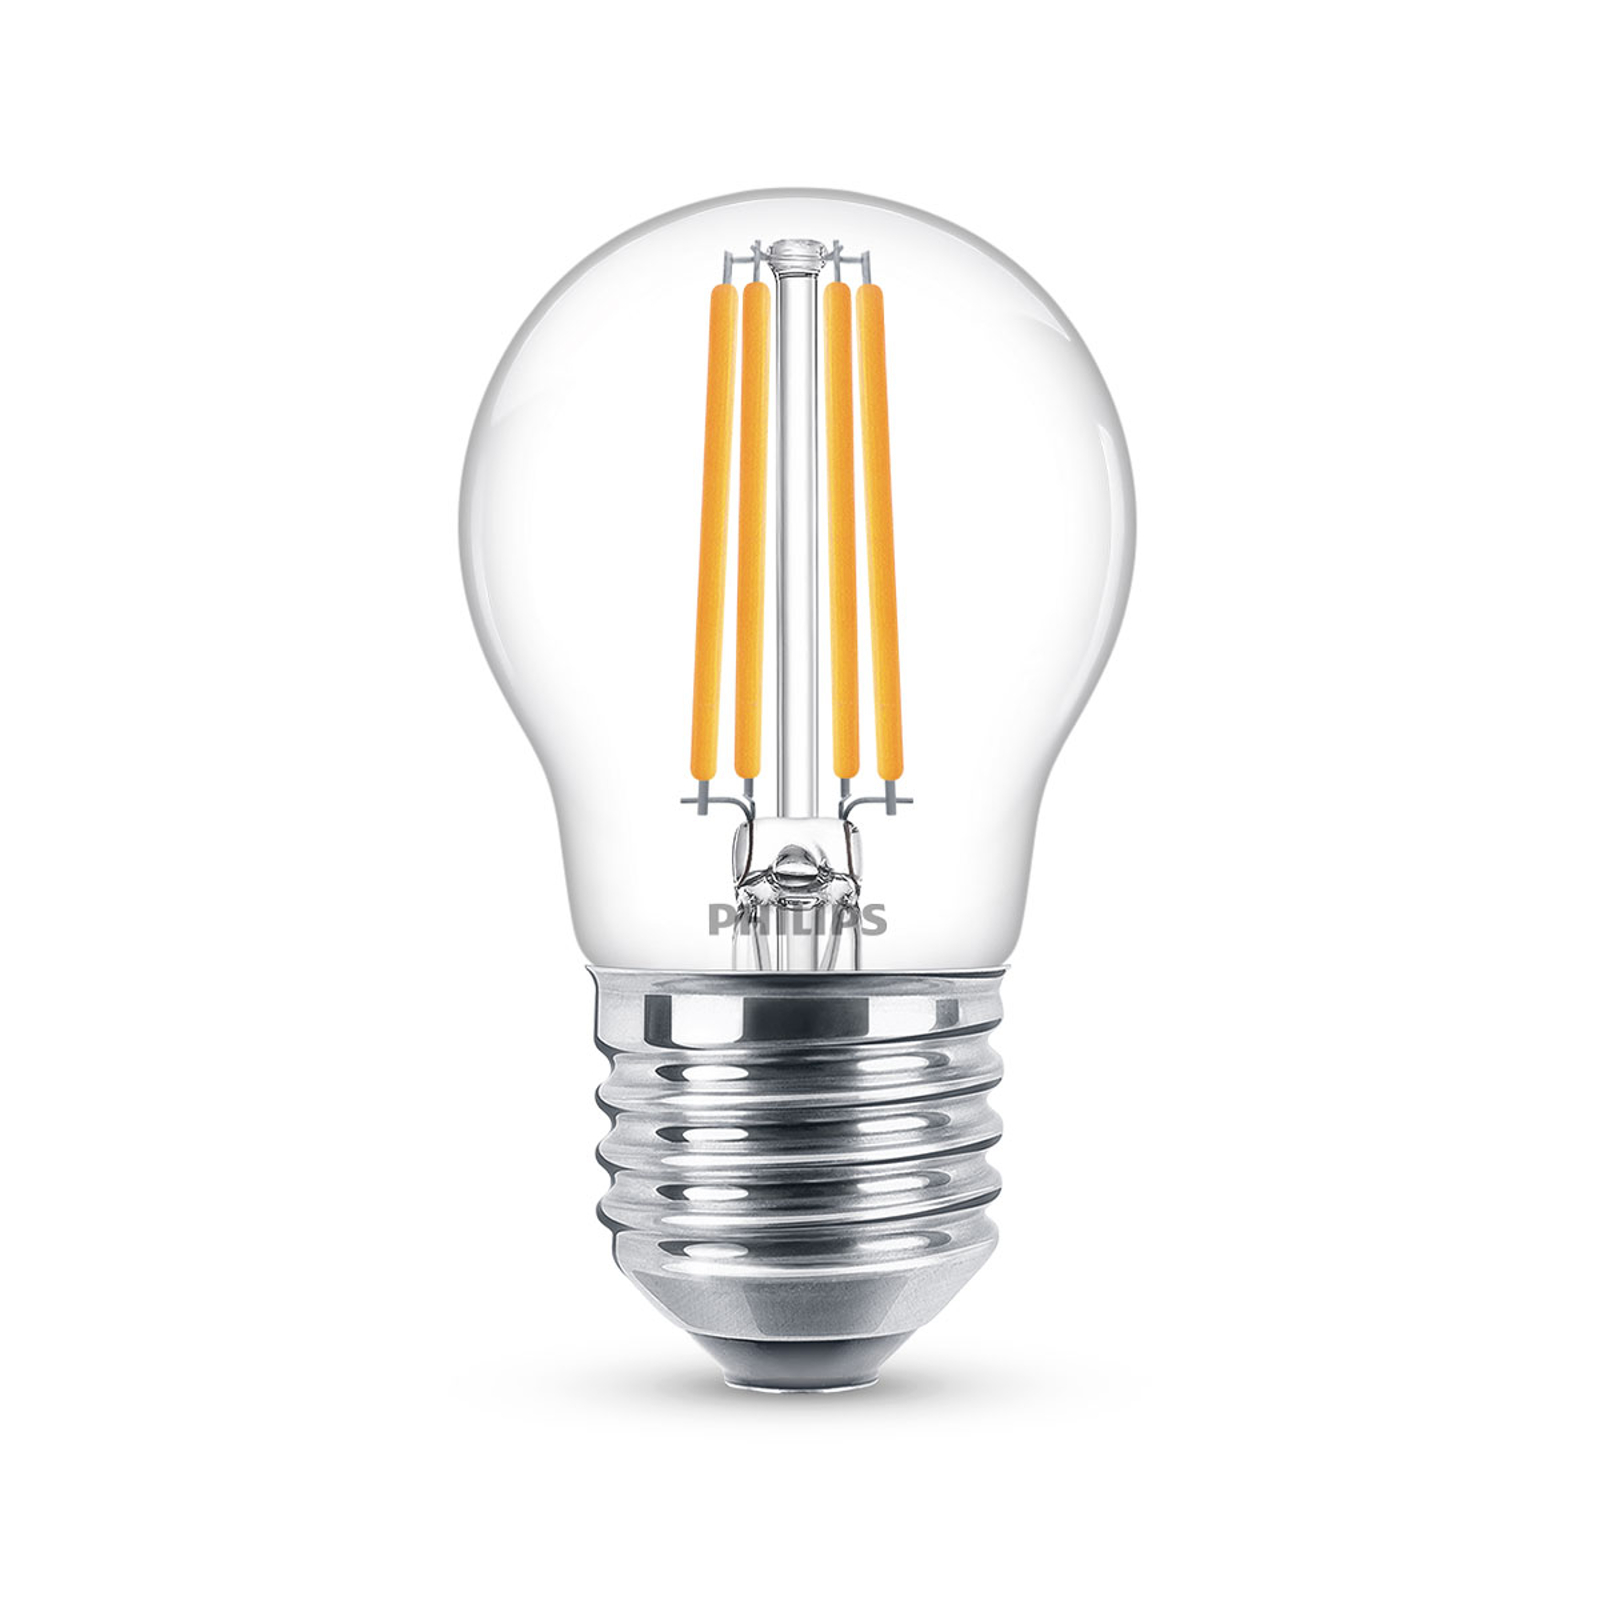 Philips Classic żarówka LED E27 P45 6,5W 2700K